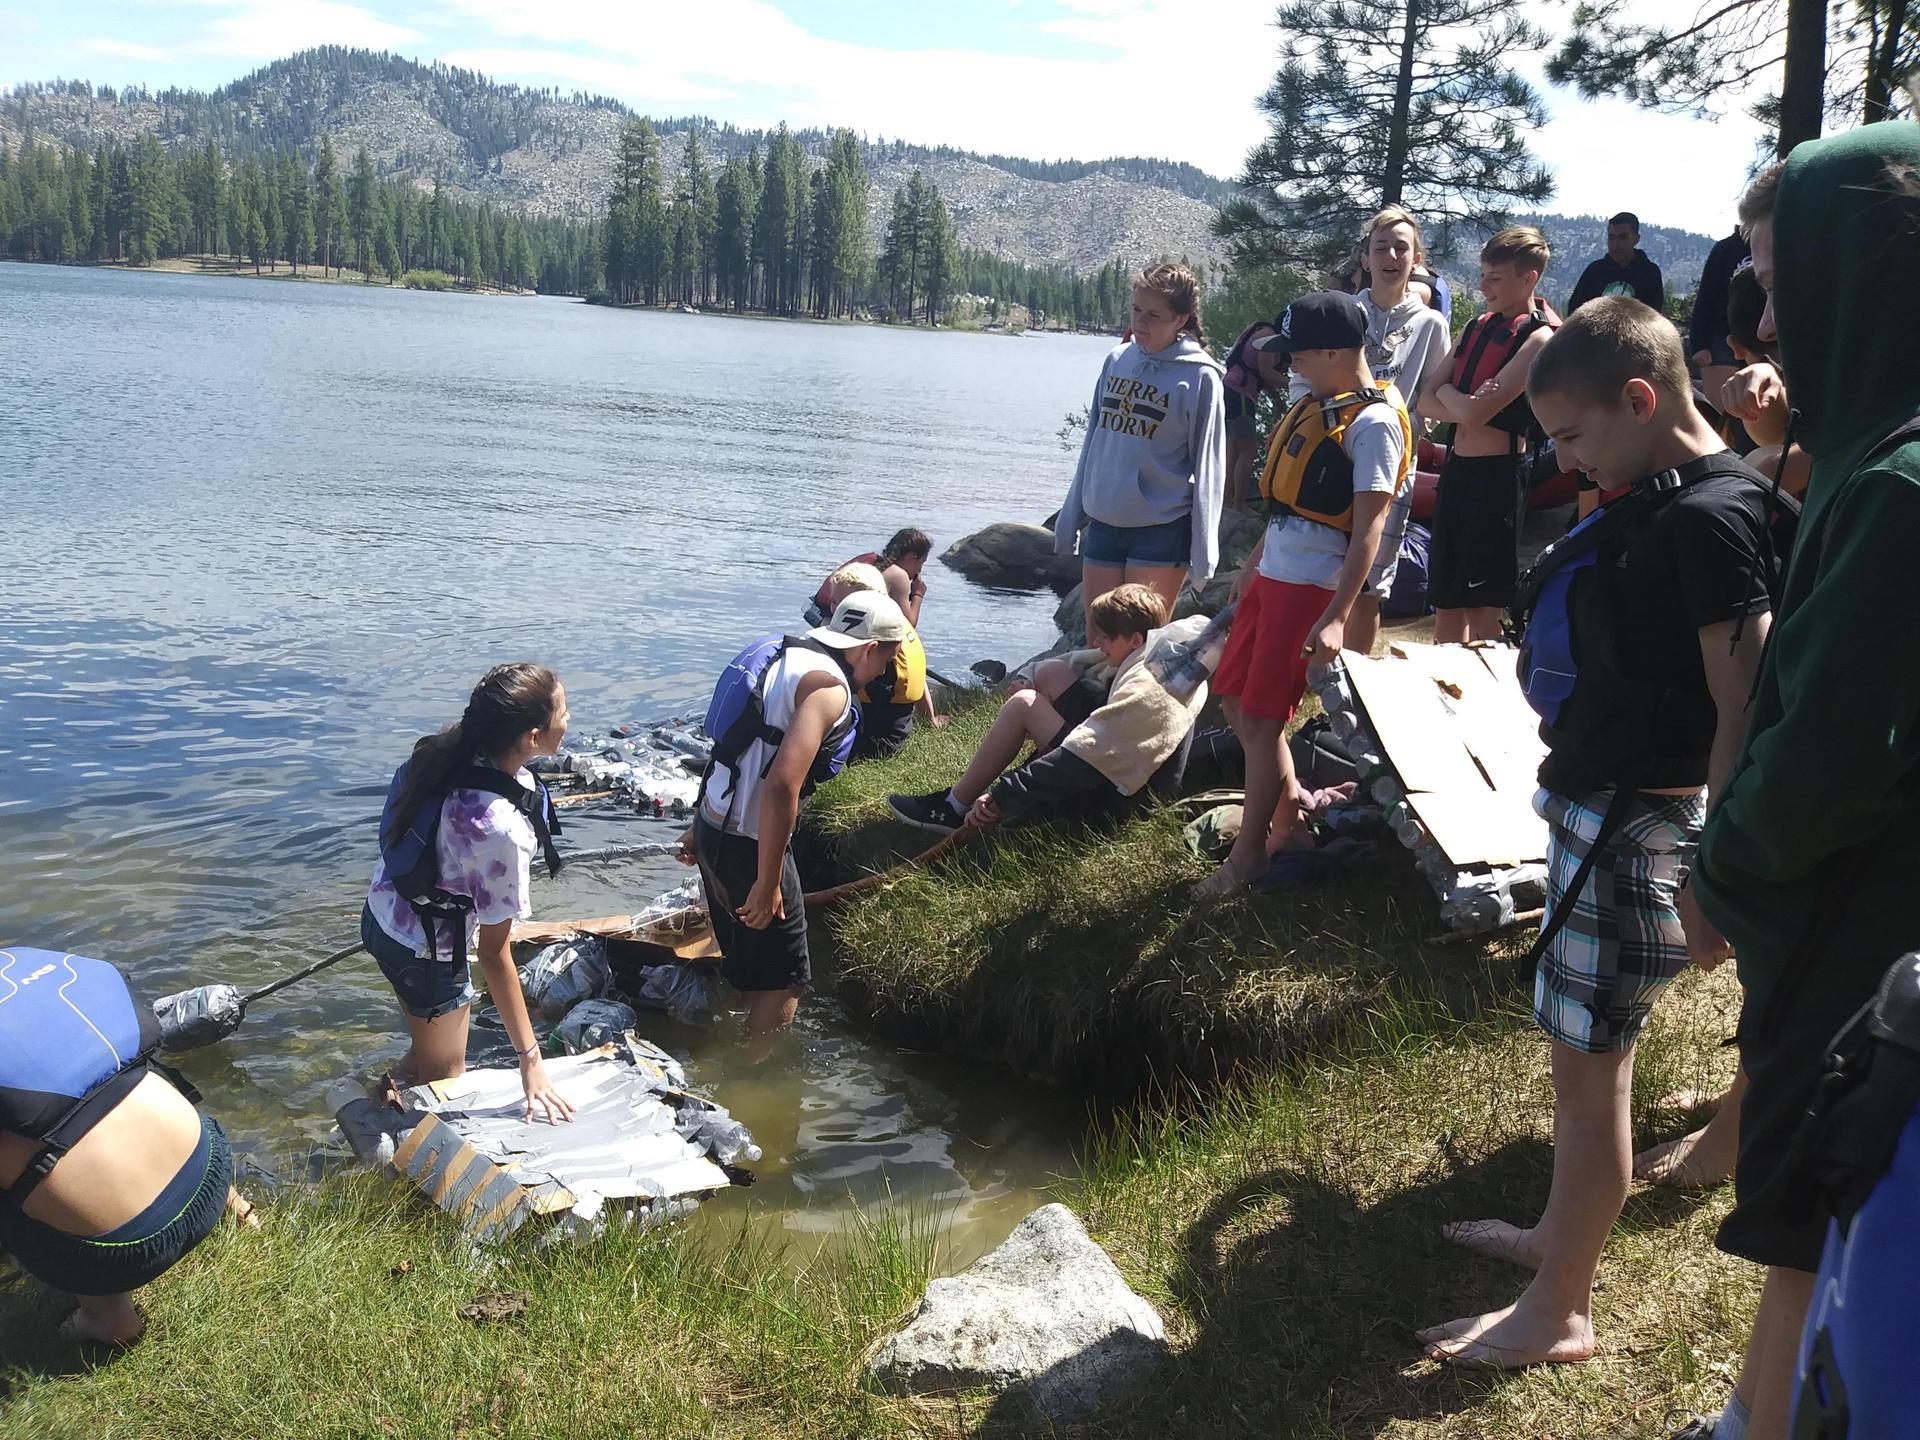 Using Makeshift Boats on Lake Davis